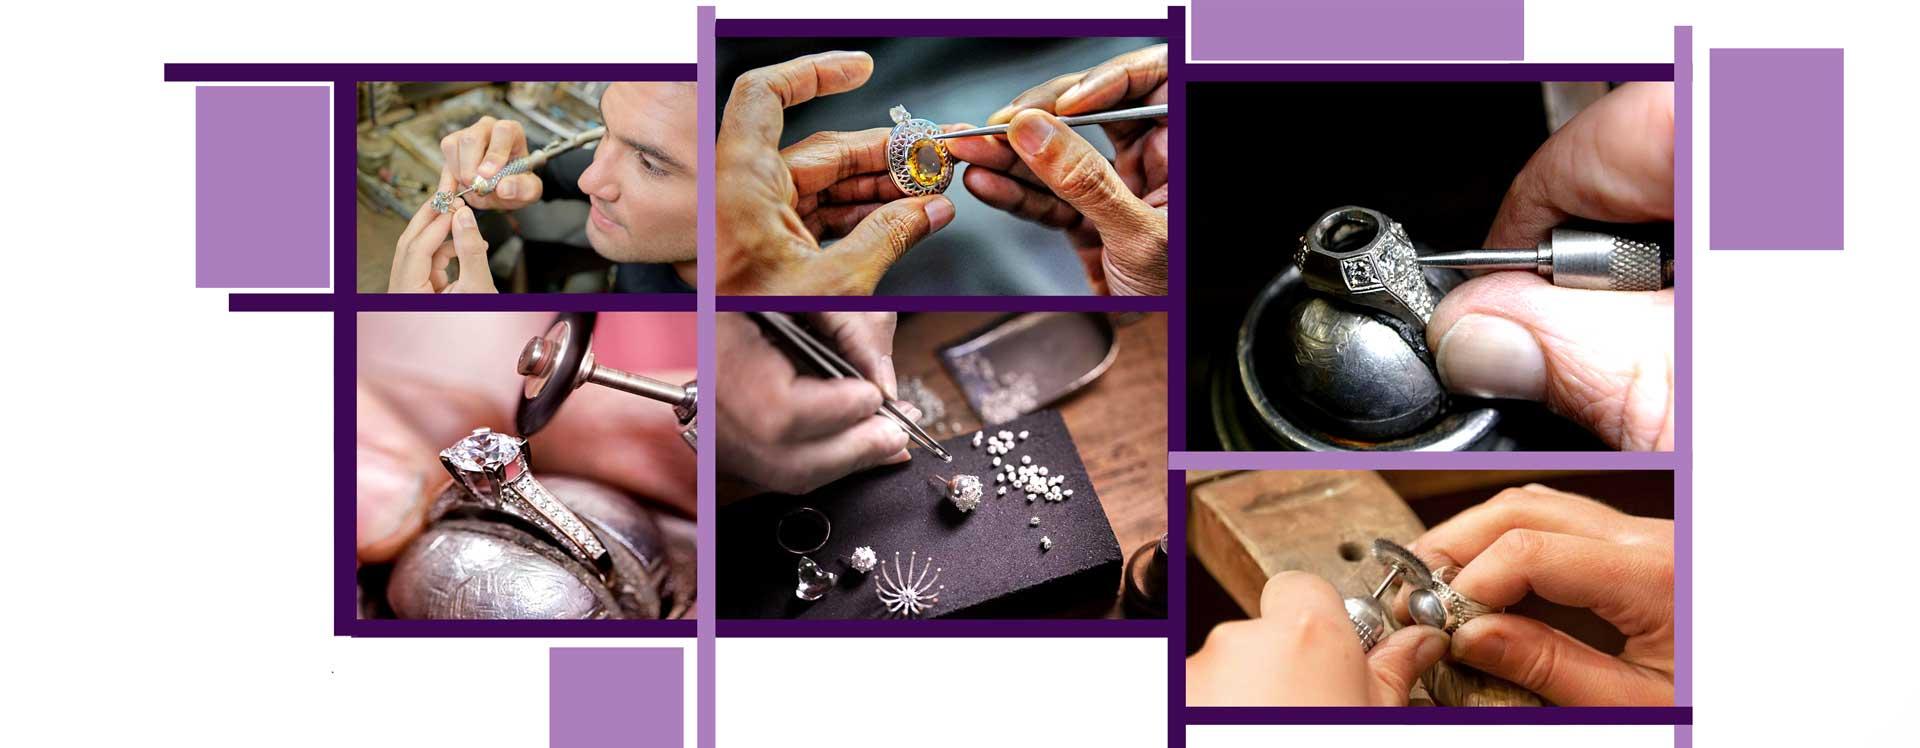 طراحی جواهرات سفارشی7